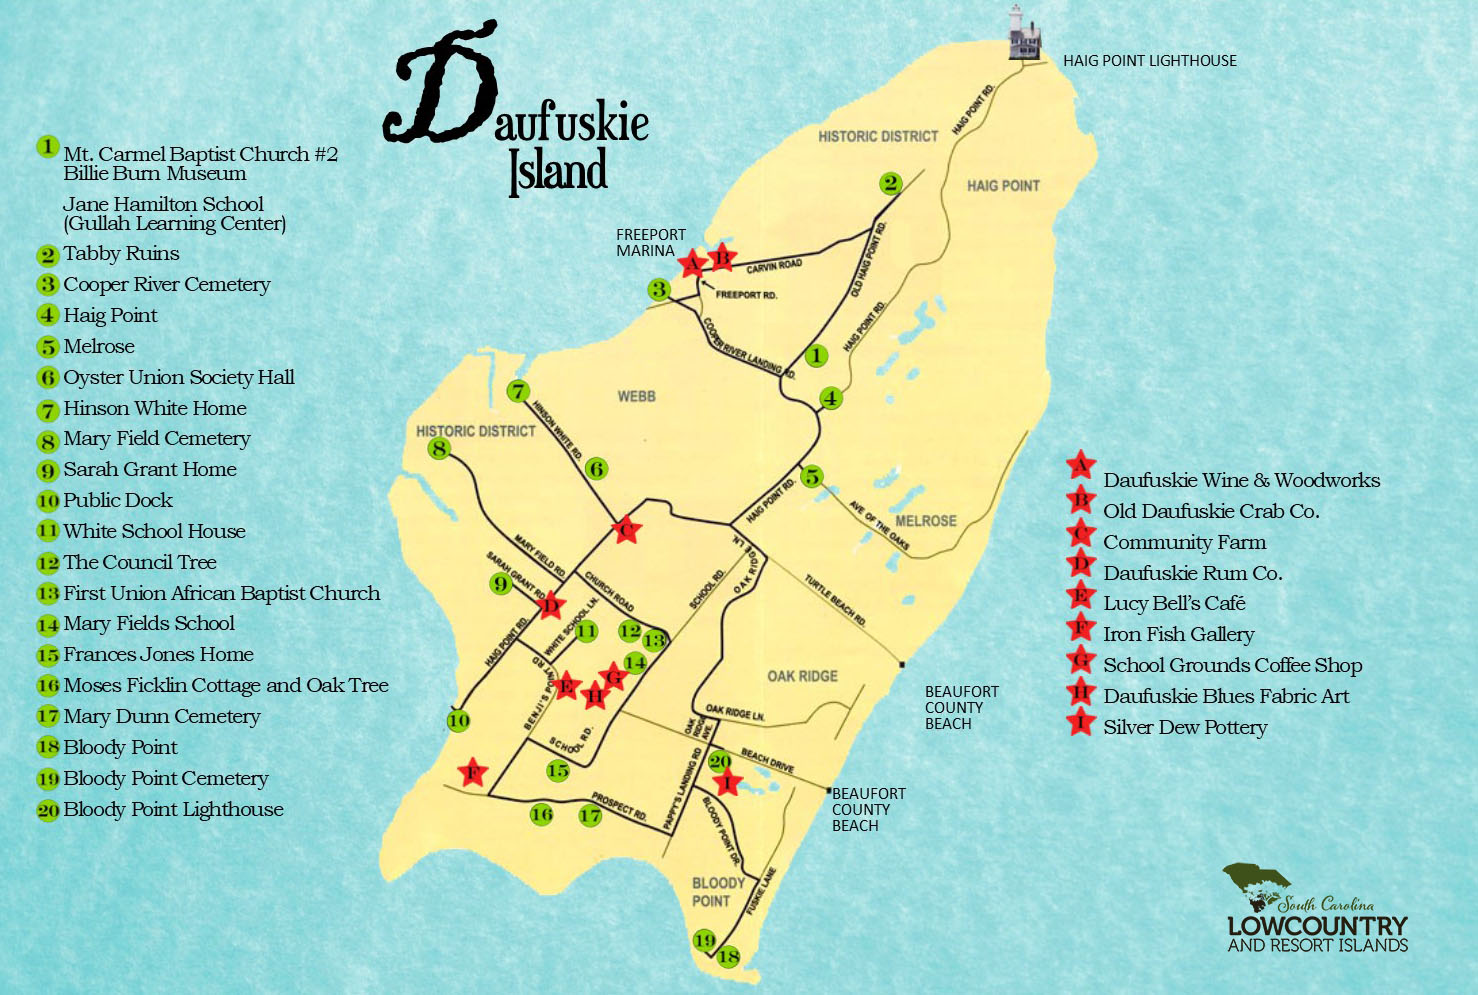 Daufuskie Day Trips | South Carolina Lowcountry on